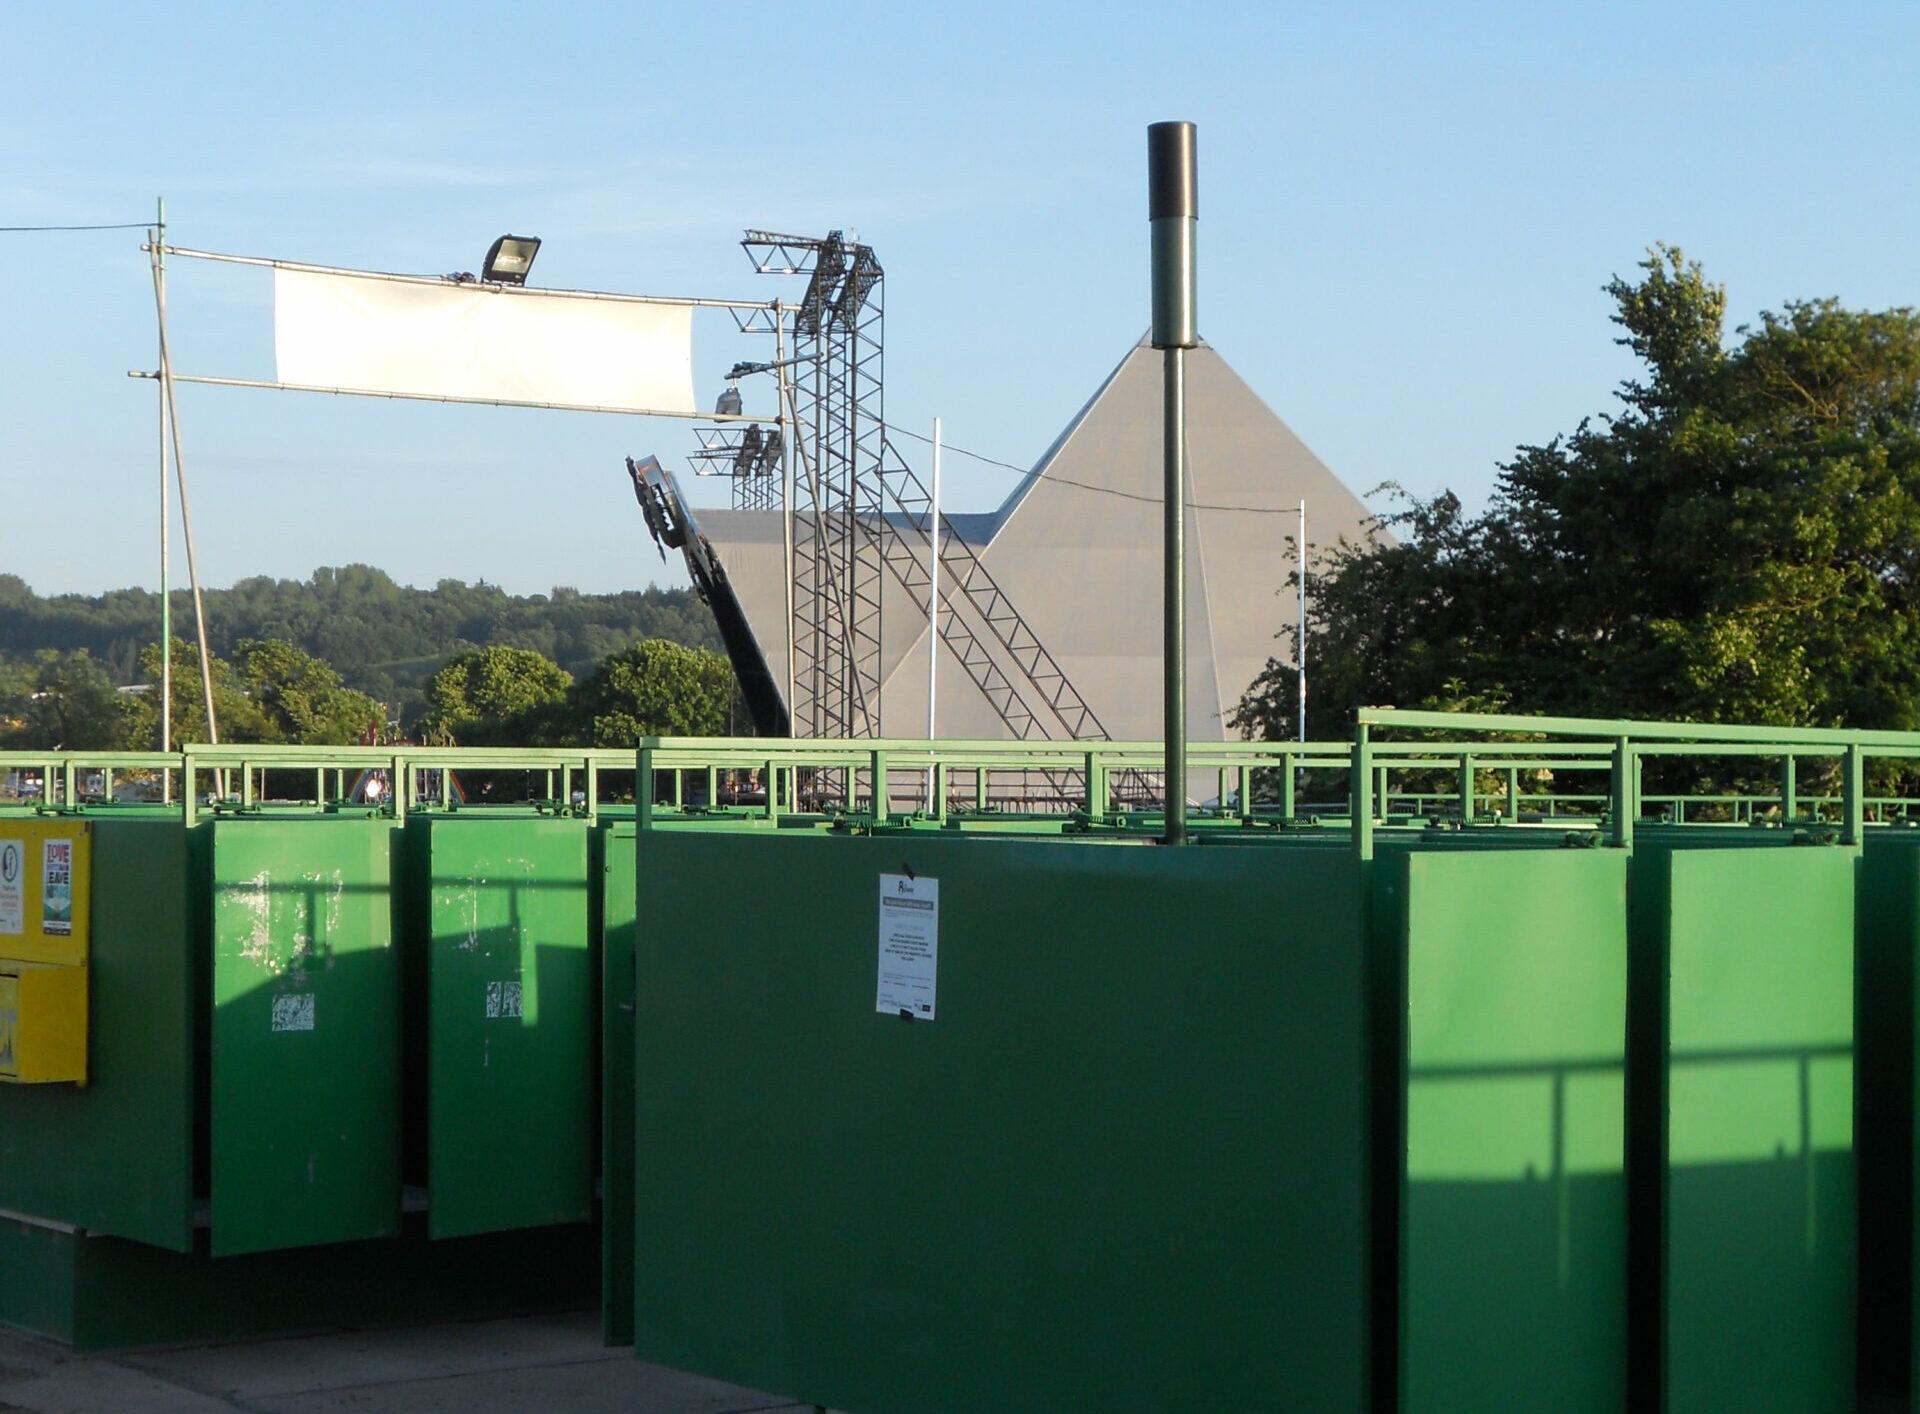 Glastonbury Festival Longdrop level monitoring